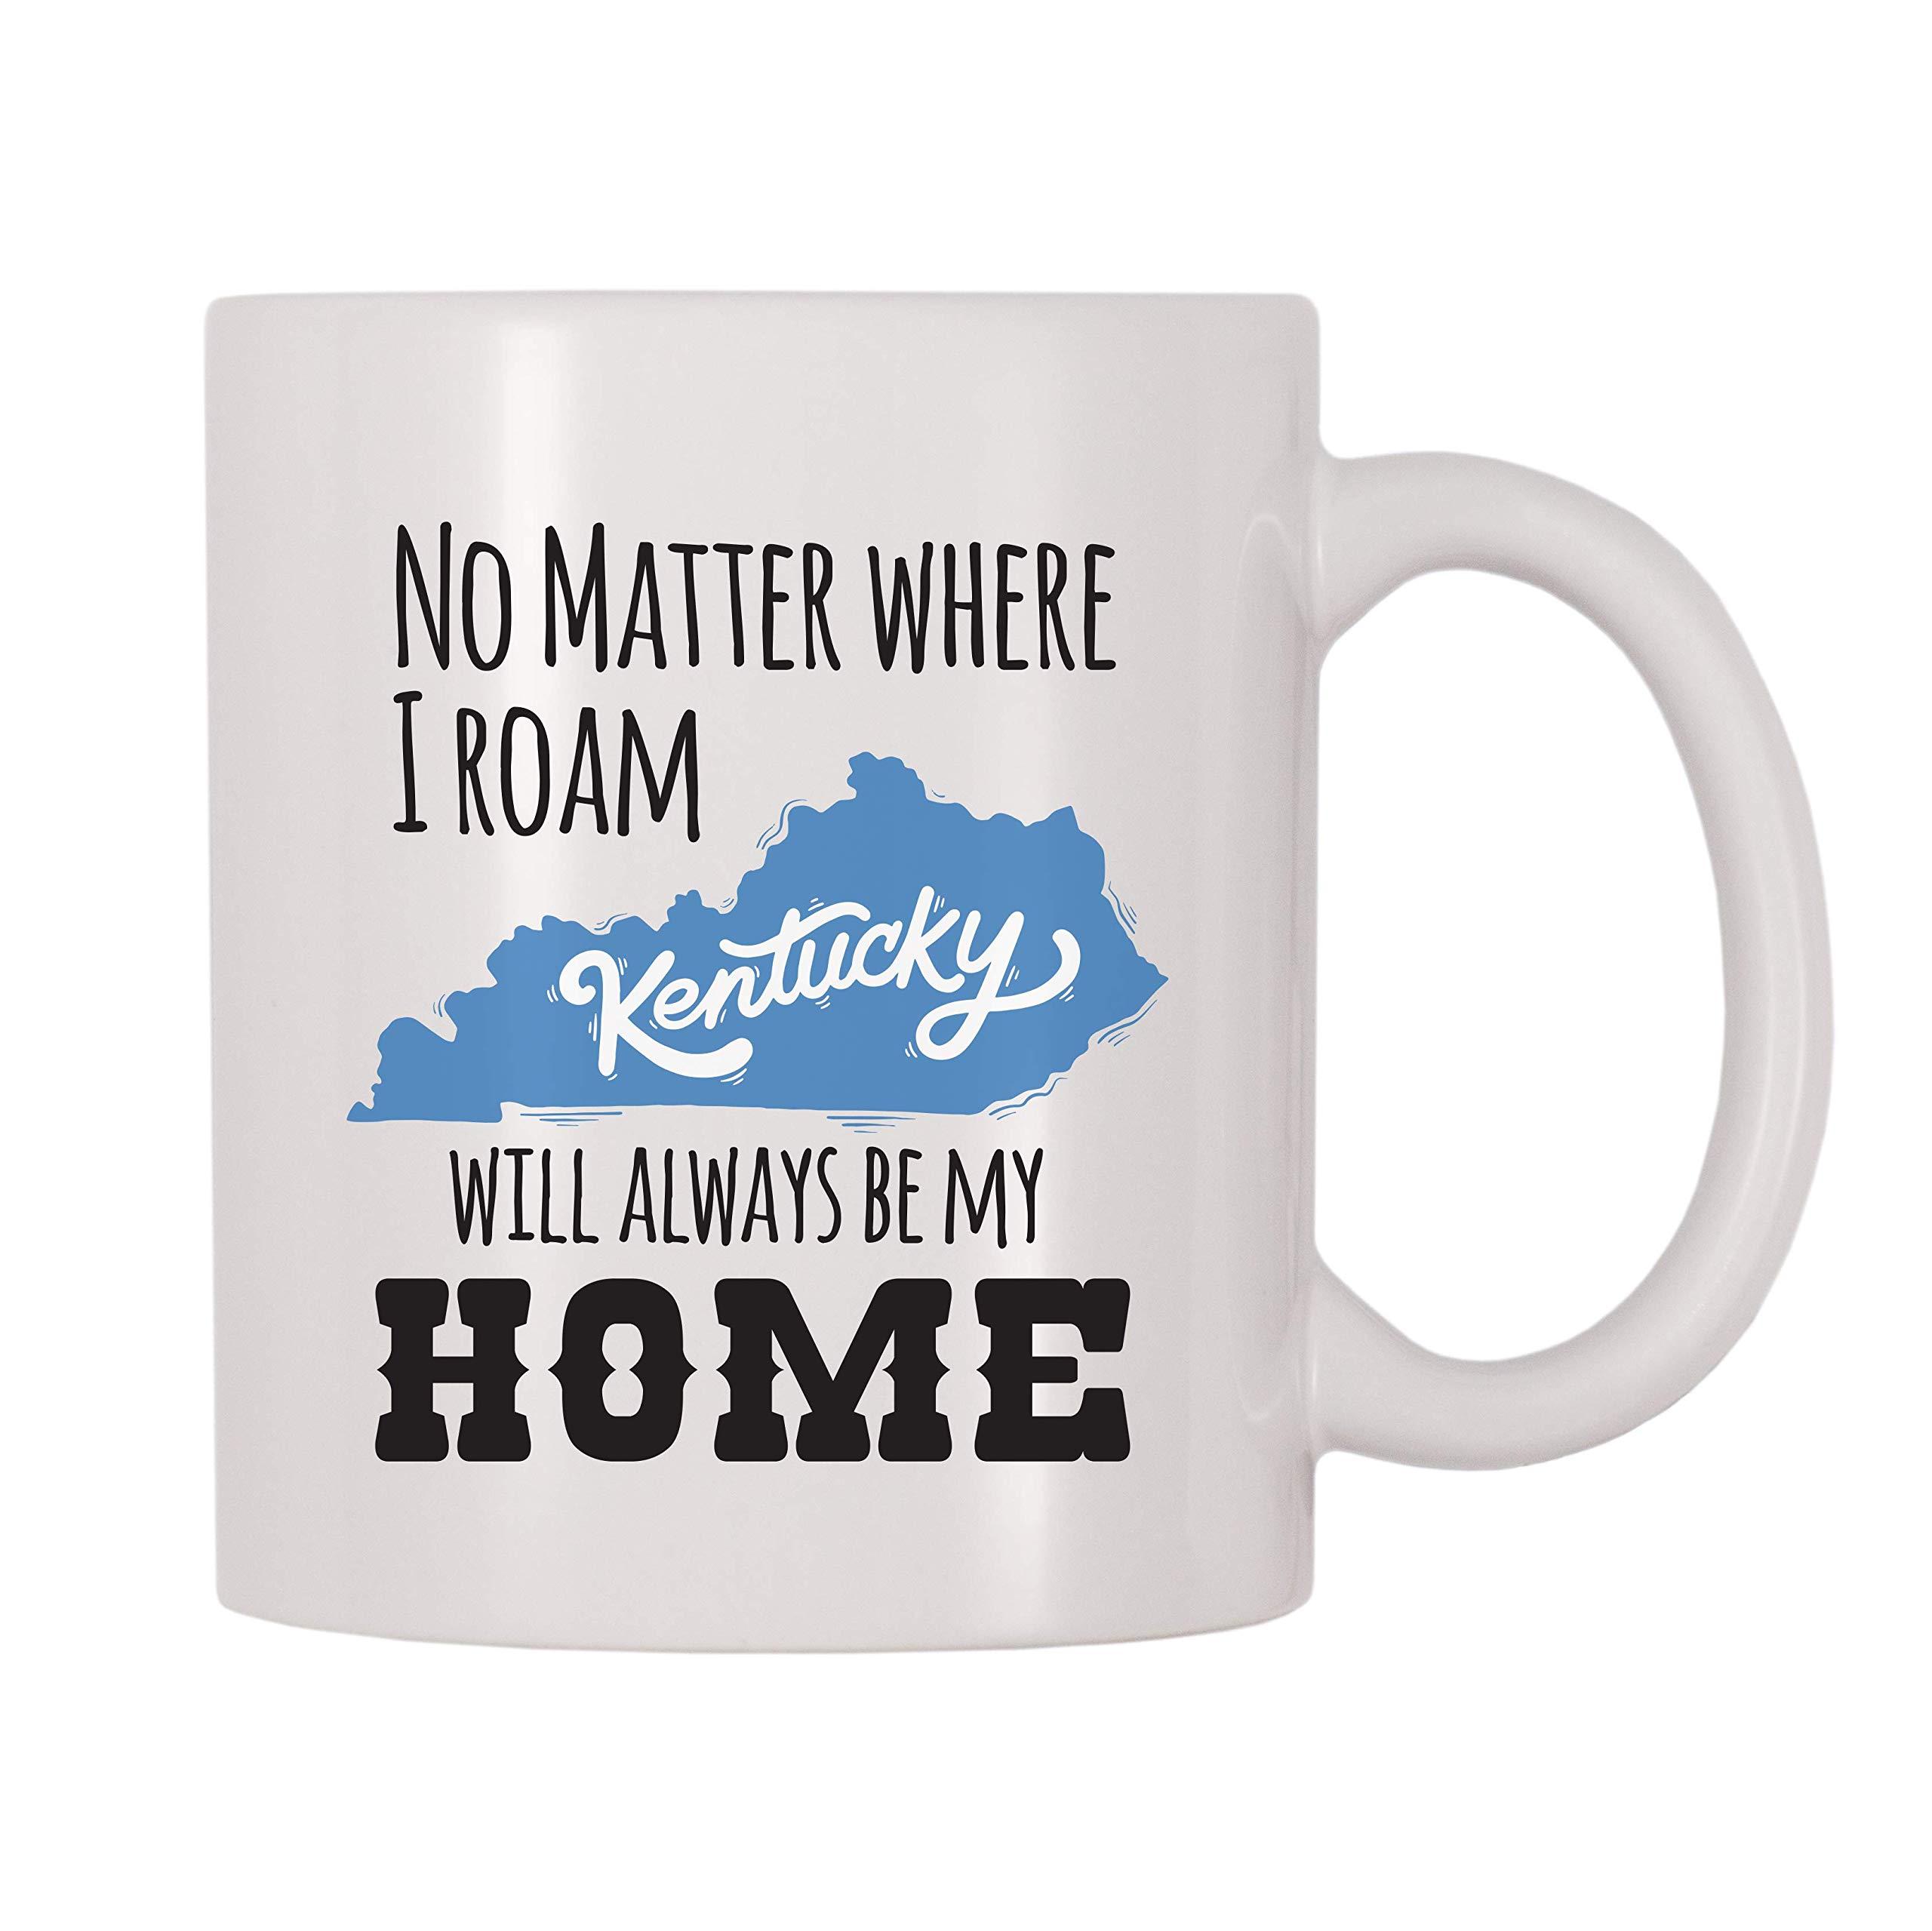 4 All Times No Matter Where I Roam Kentucky Will Always Be My Home Coffee Mug (11 oz)